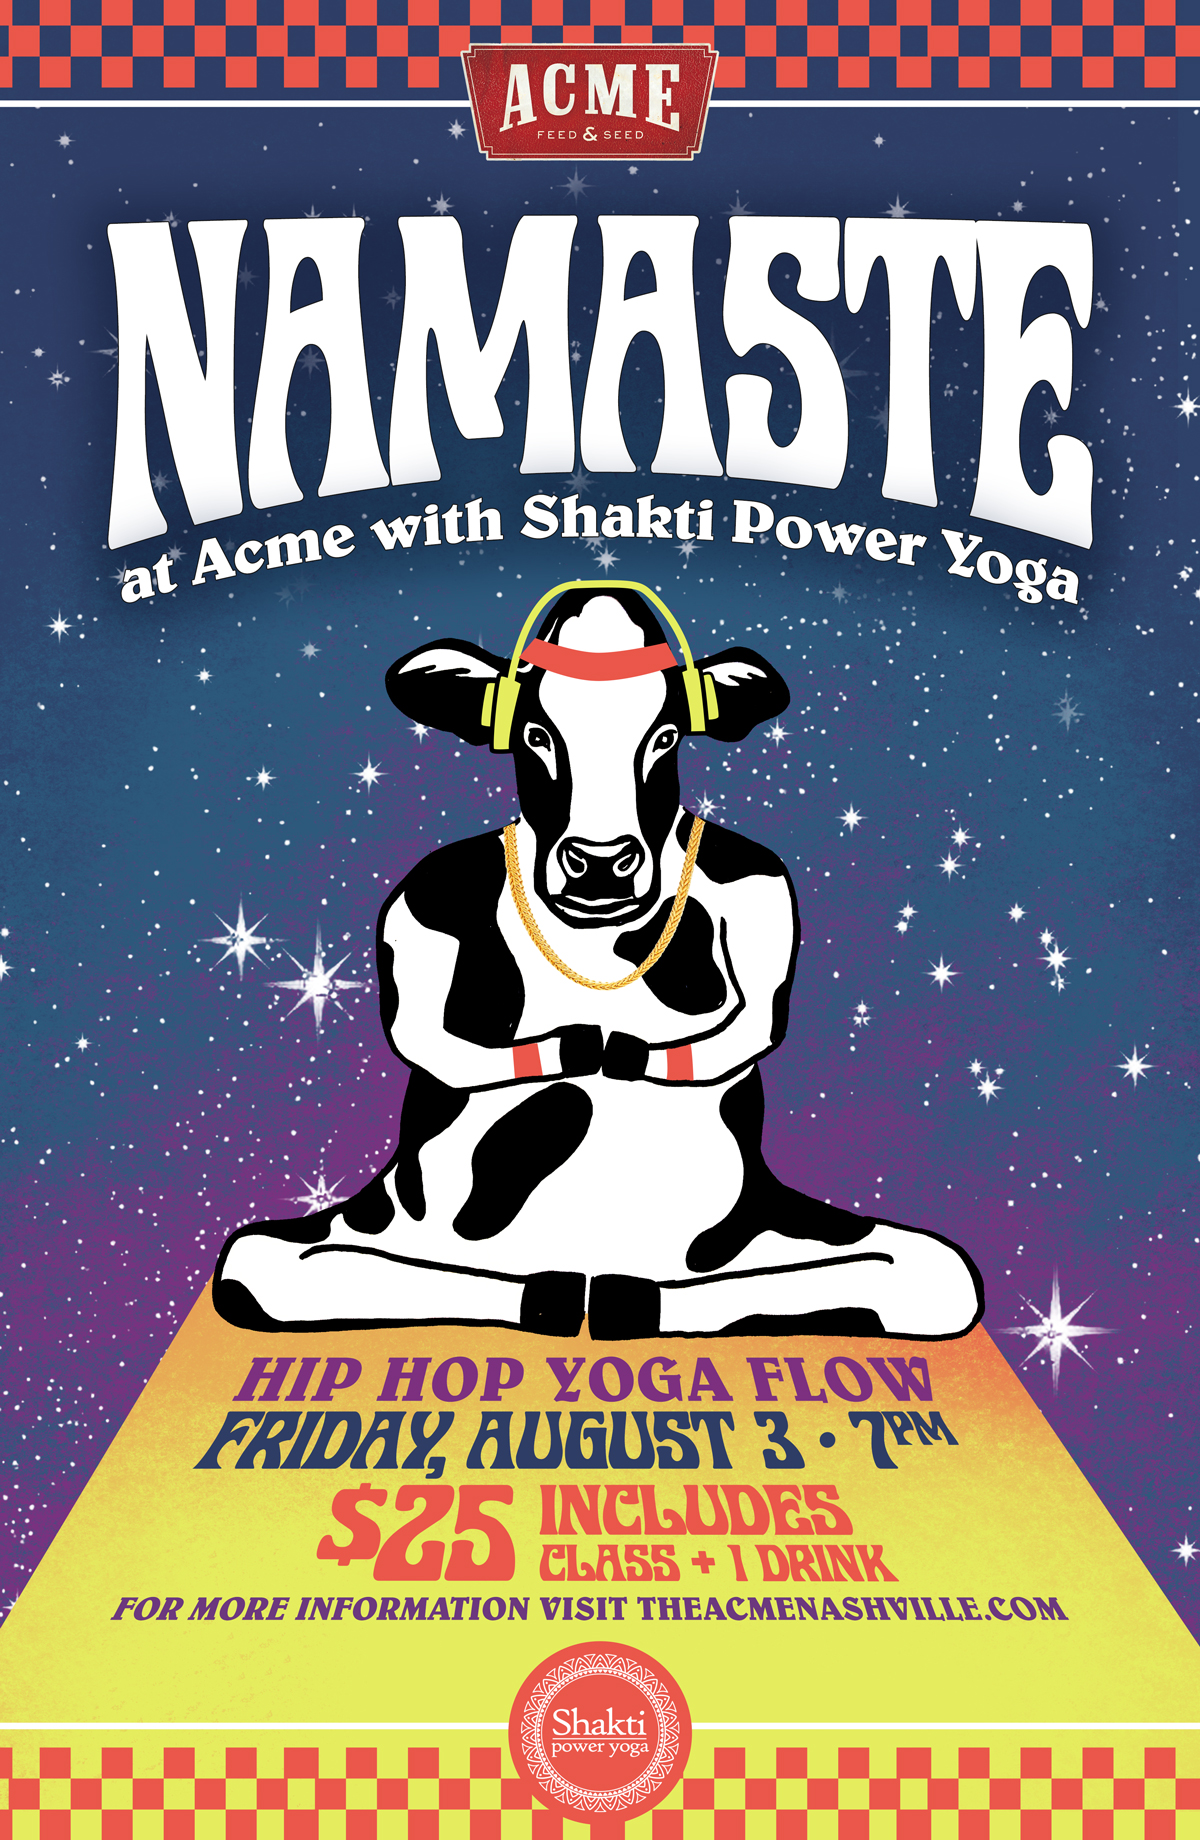 Namaste Hip Hop Yoga Flow Nashville Guru